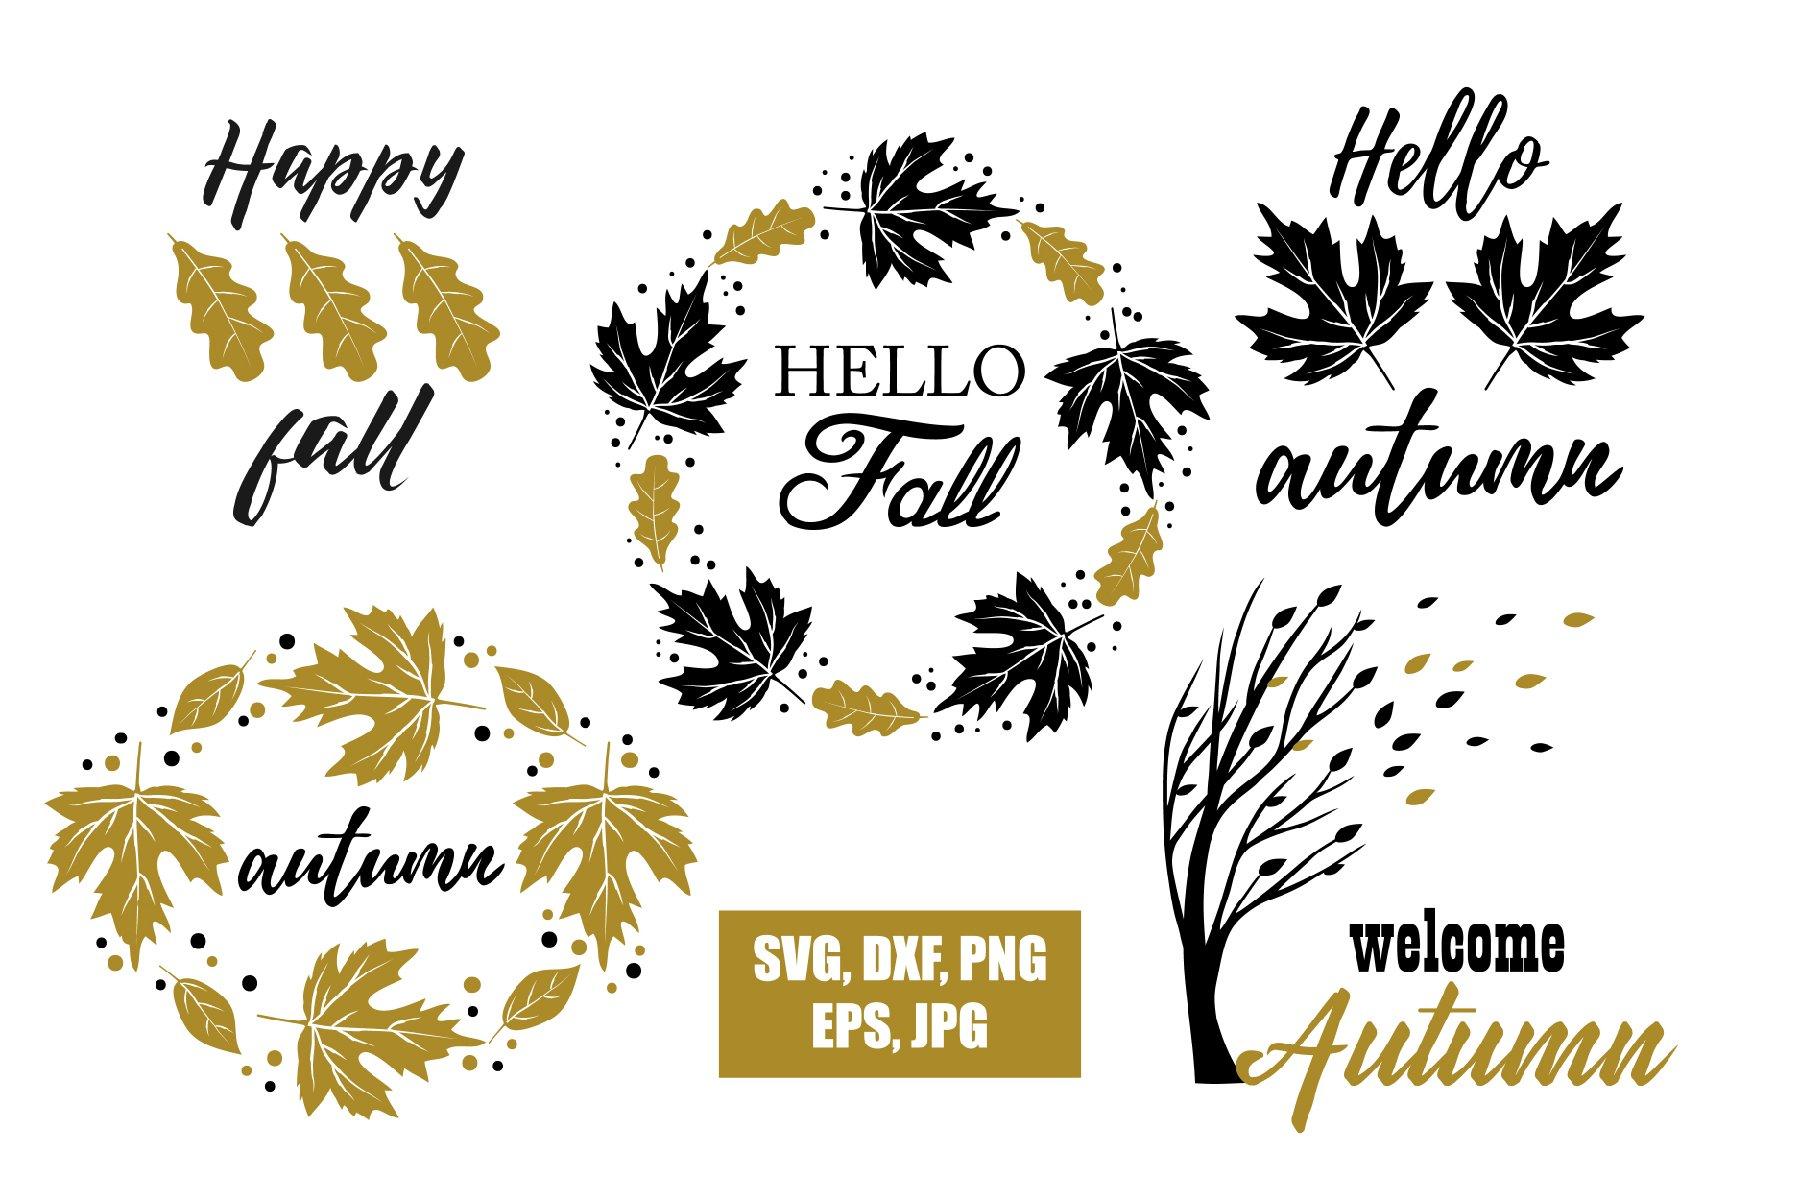 Fall Leaves Svg Files For Cricut Hello Fall Svg Fall Wreath 907338 Cut Files Design Bundles